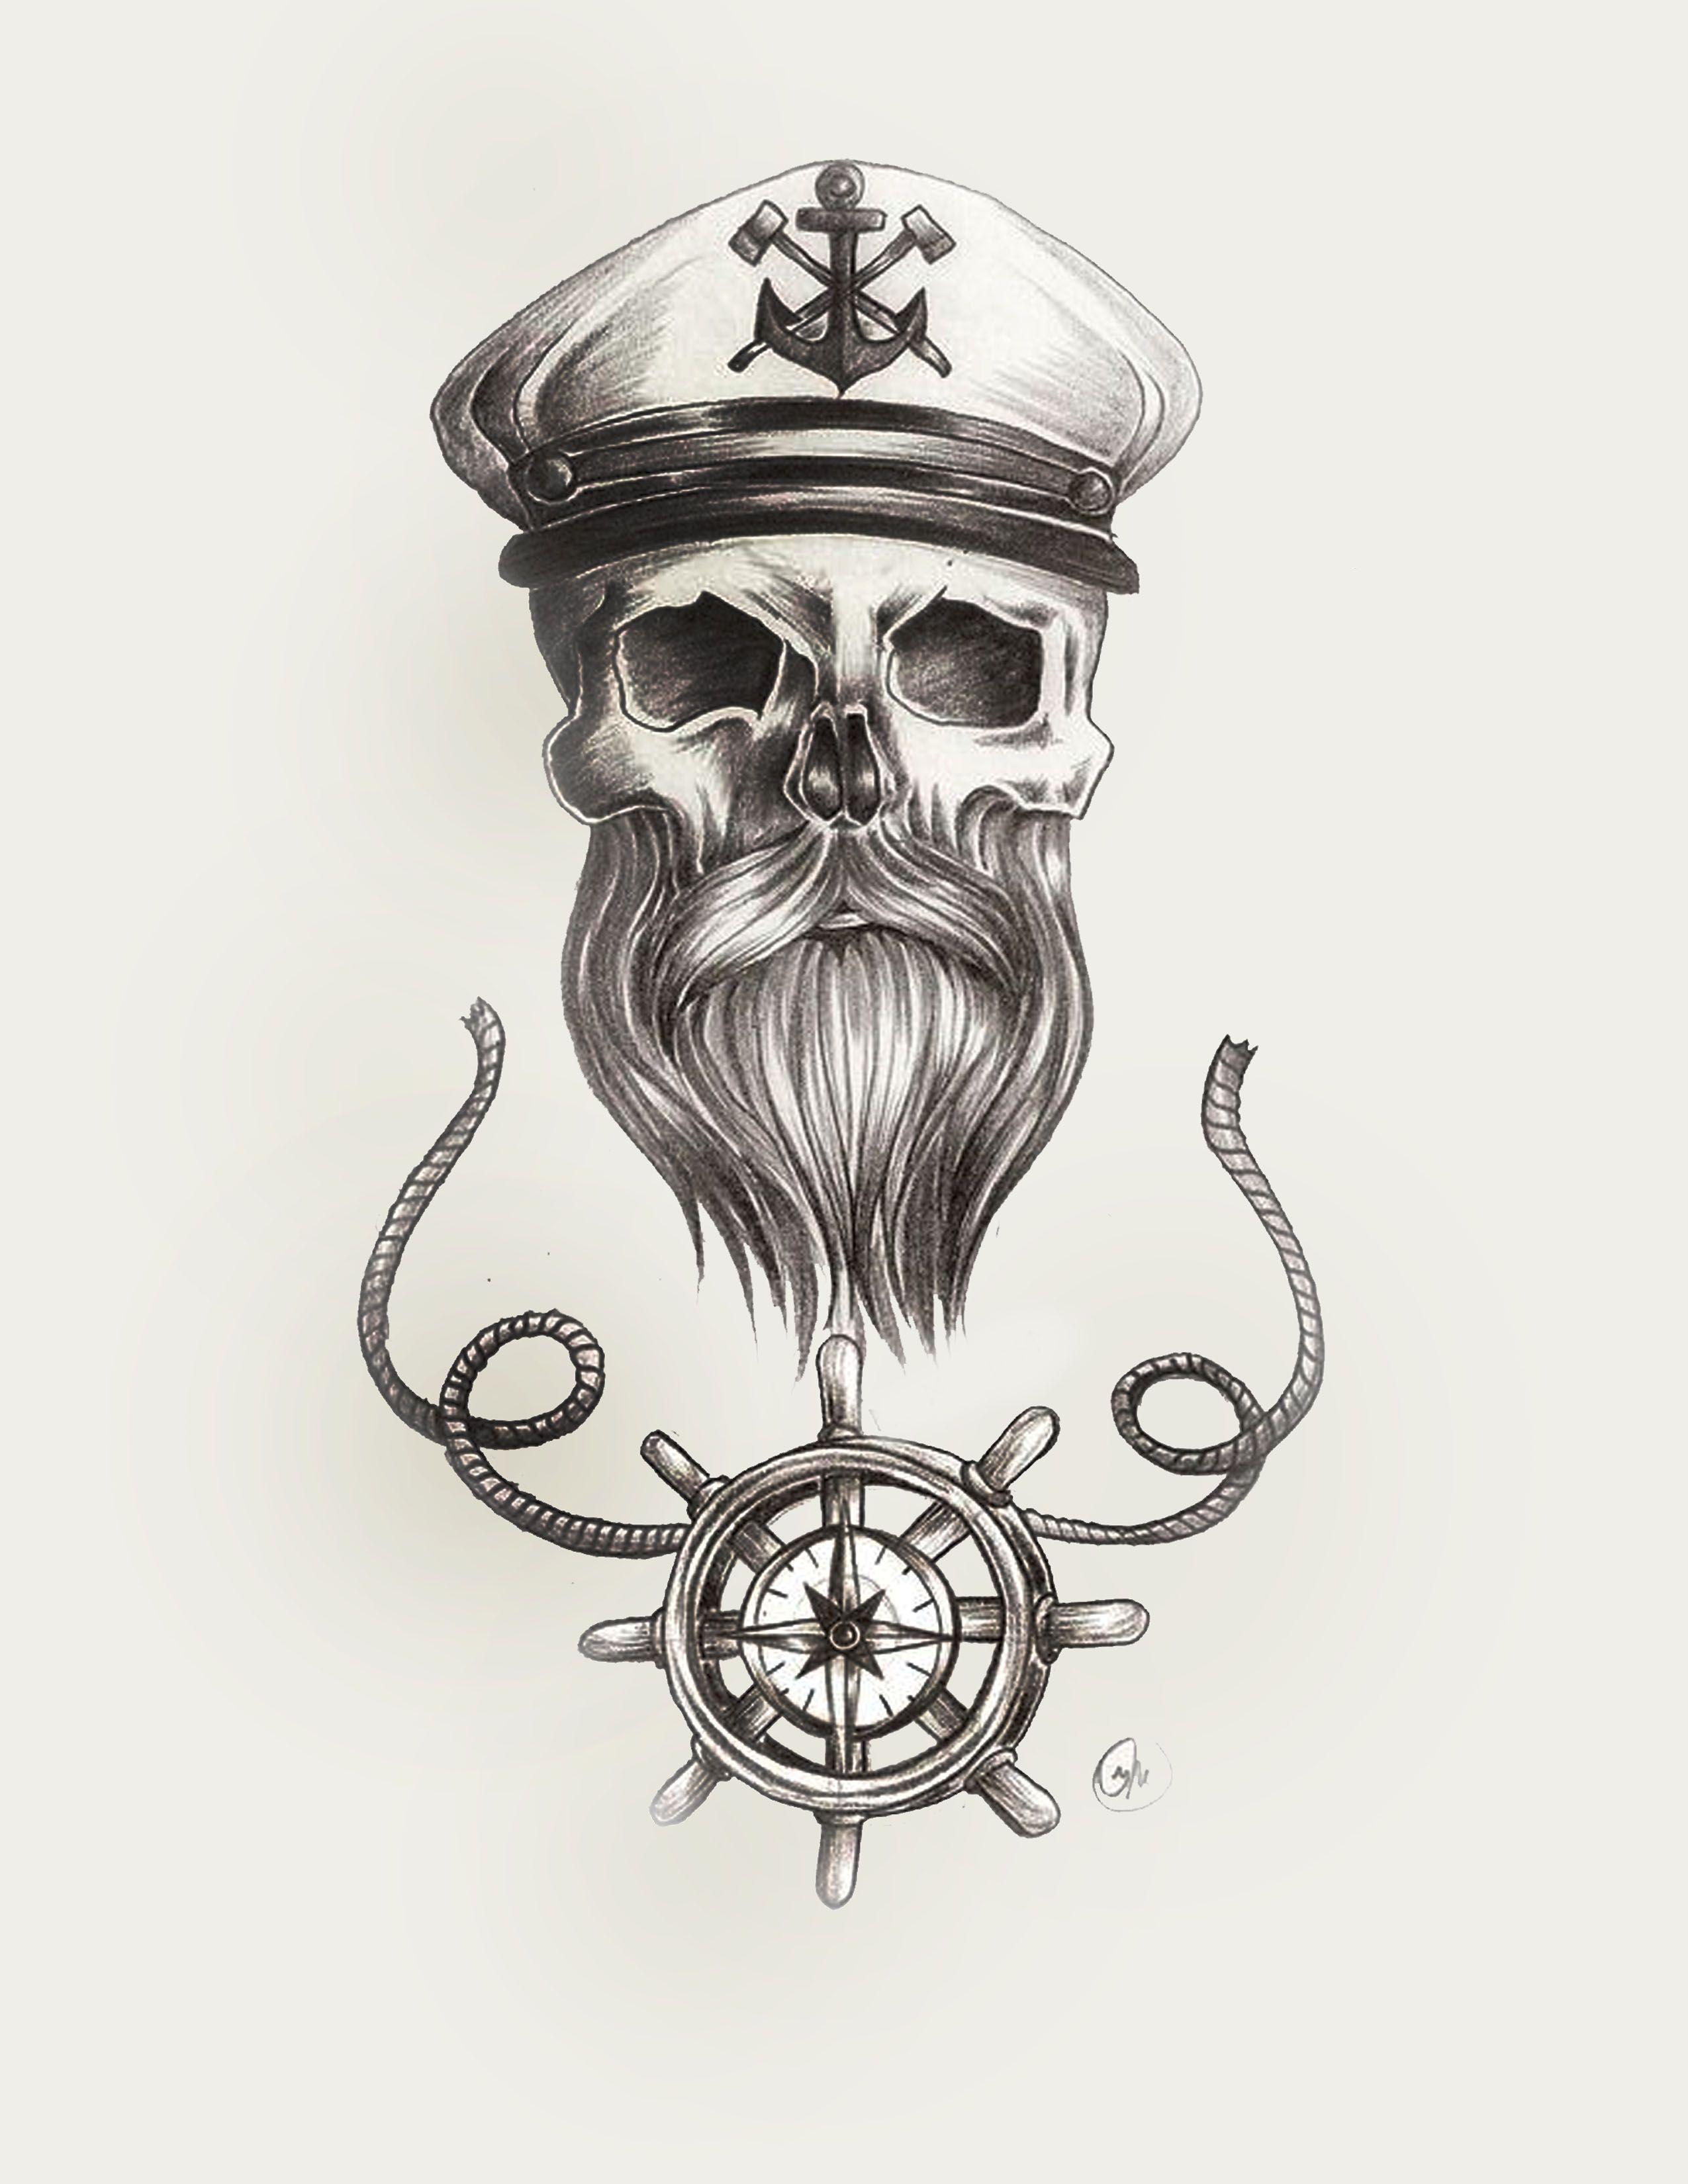 Pin by david mckenzie on skulls pinterest tattoos skull and